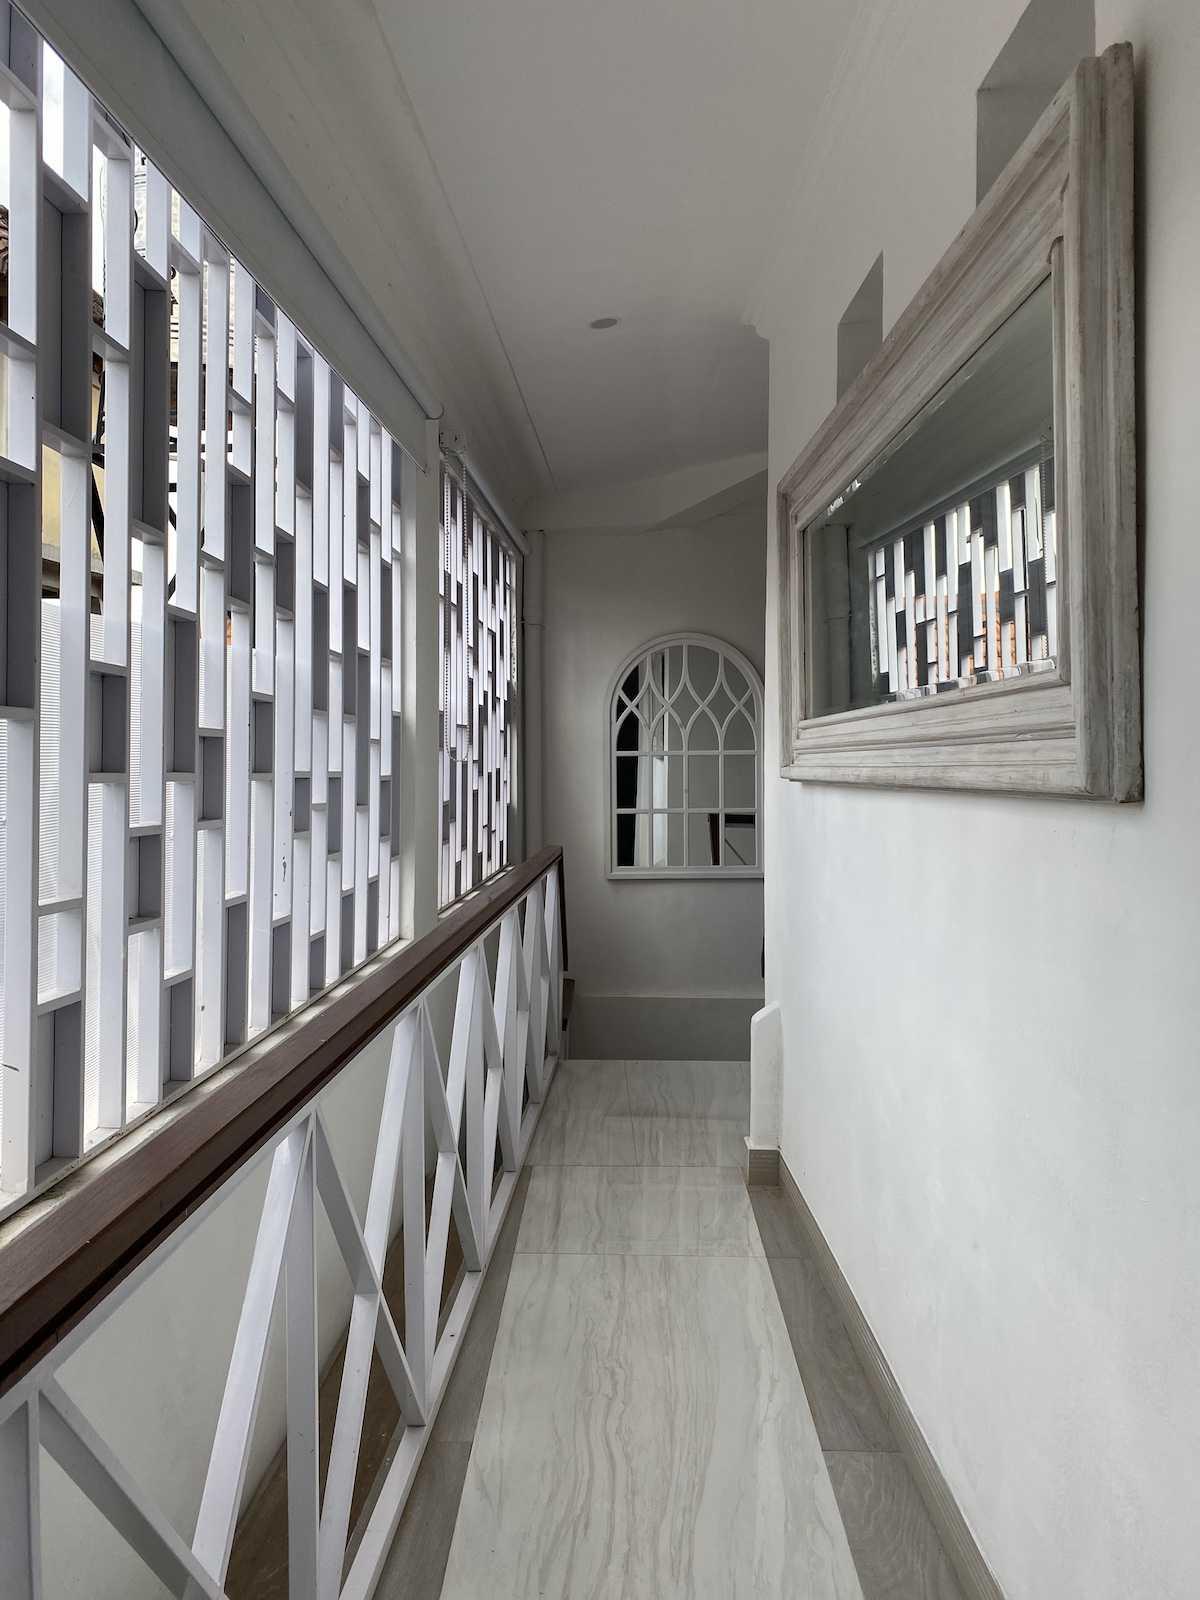 Studio Asri Jalak House Canggu, Kec. Kuta Utara, Kabupaten Badung, Bali, Indonesia Canggu, Kec. Kuta Utara, Kabupaten Badung, Bali, Indonesia Studio-Asri-Jalak-House   98853